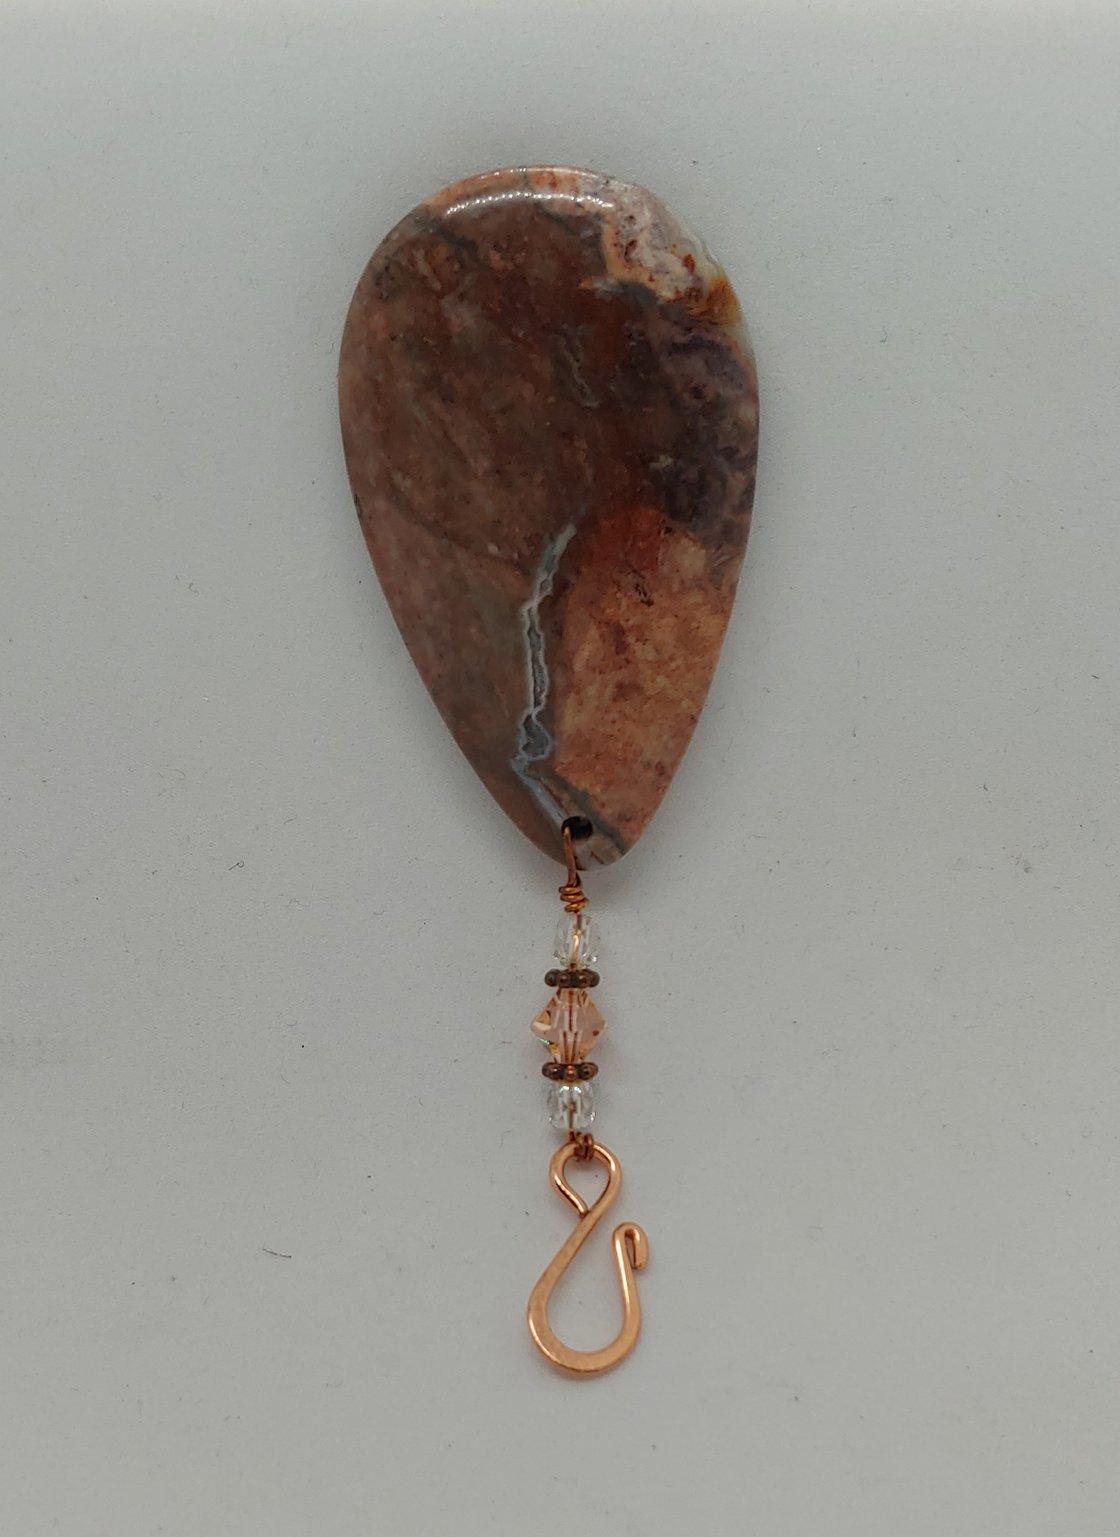 Image of Portuguese Knitting pin #21-488